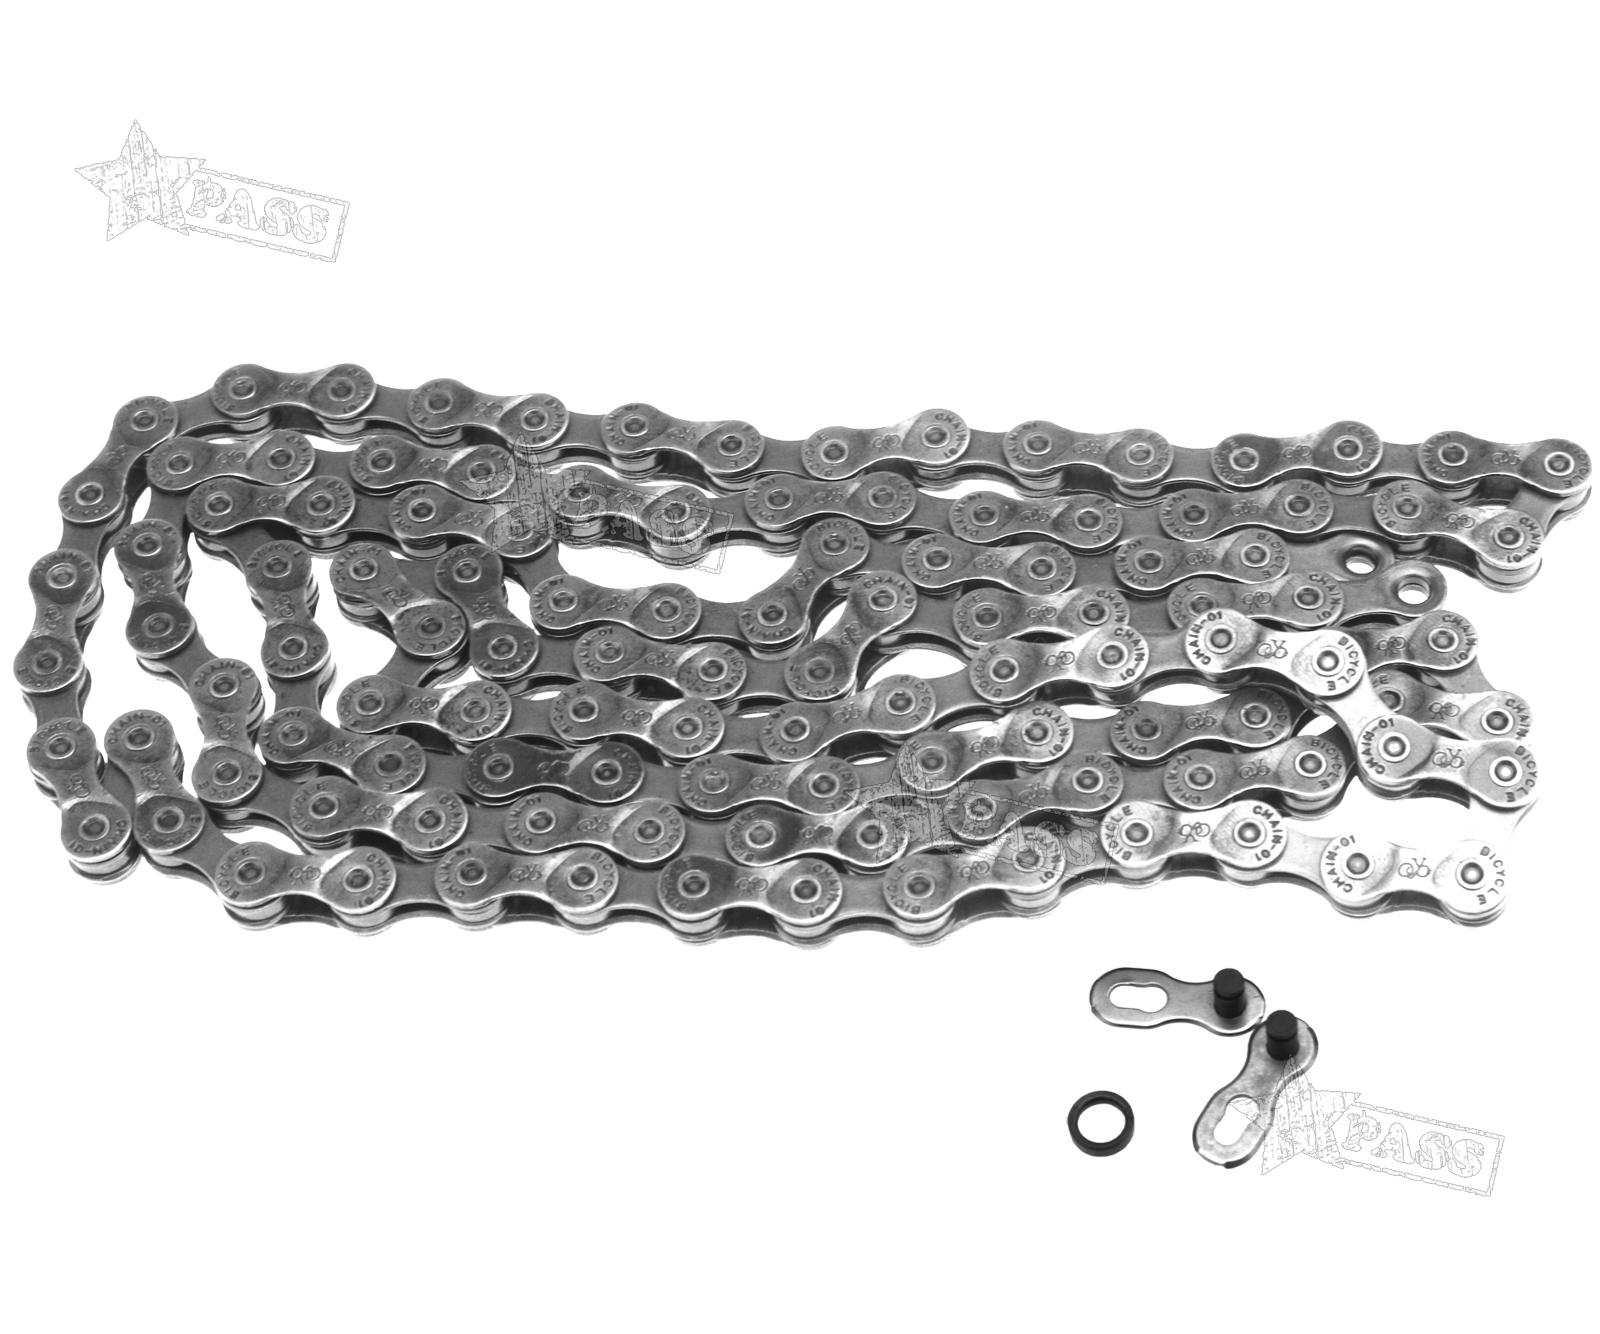 9 Speed 114Links MTB Chain Bicycle bike cycle Chain For SRAM PC-951